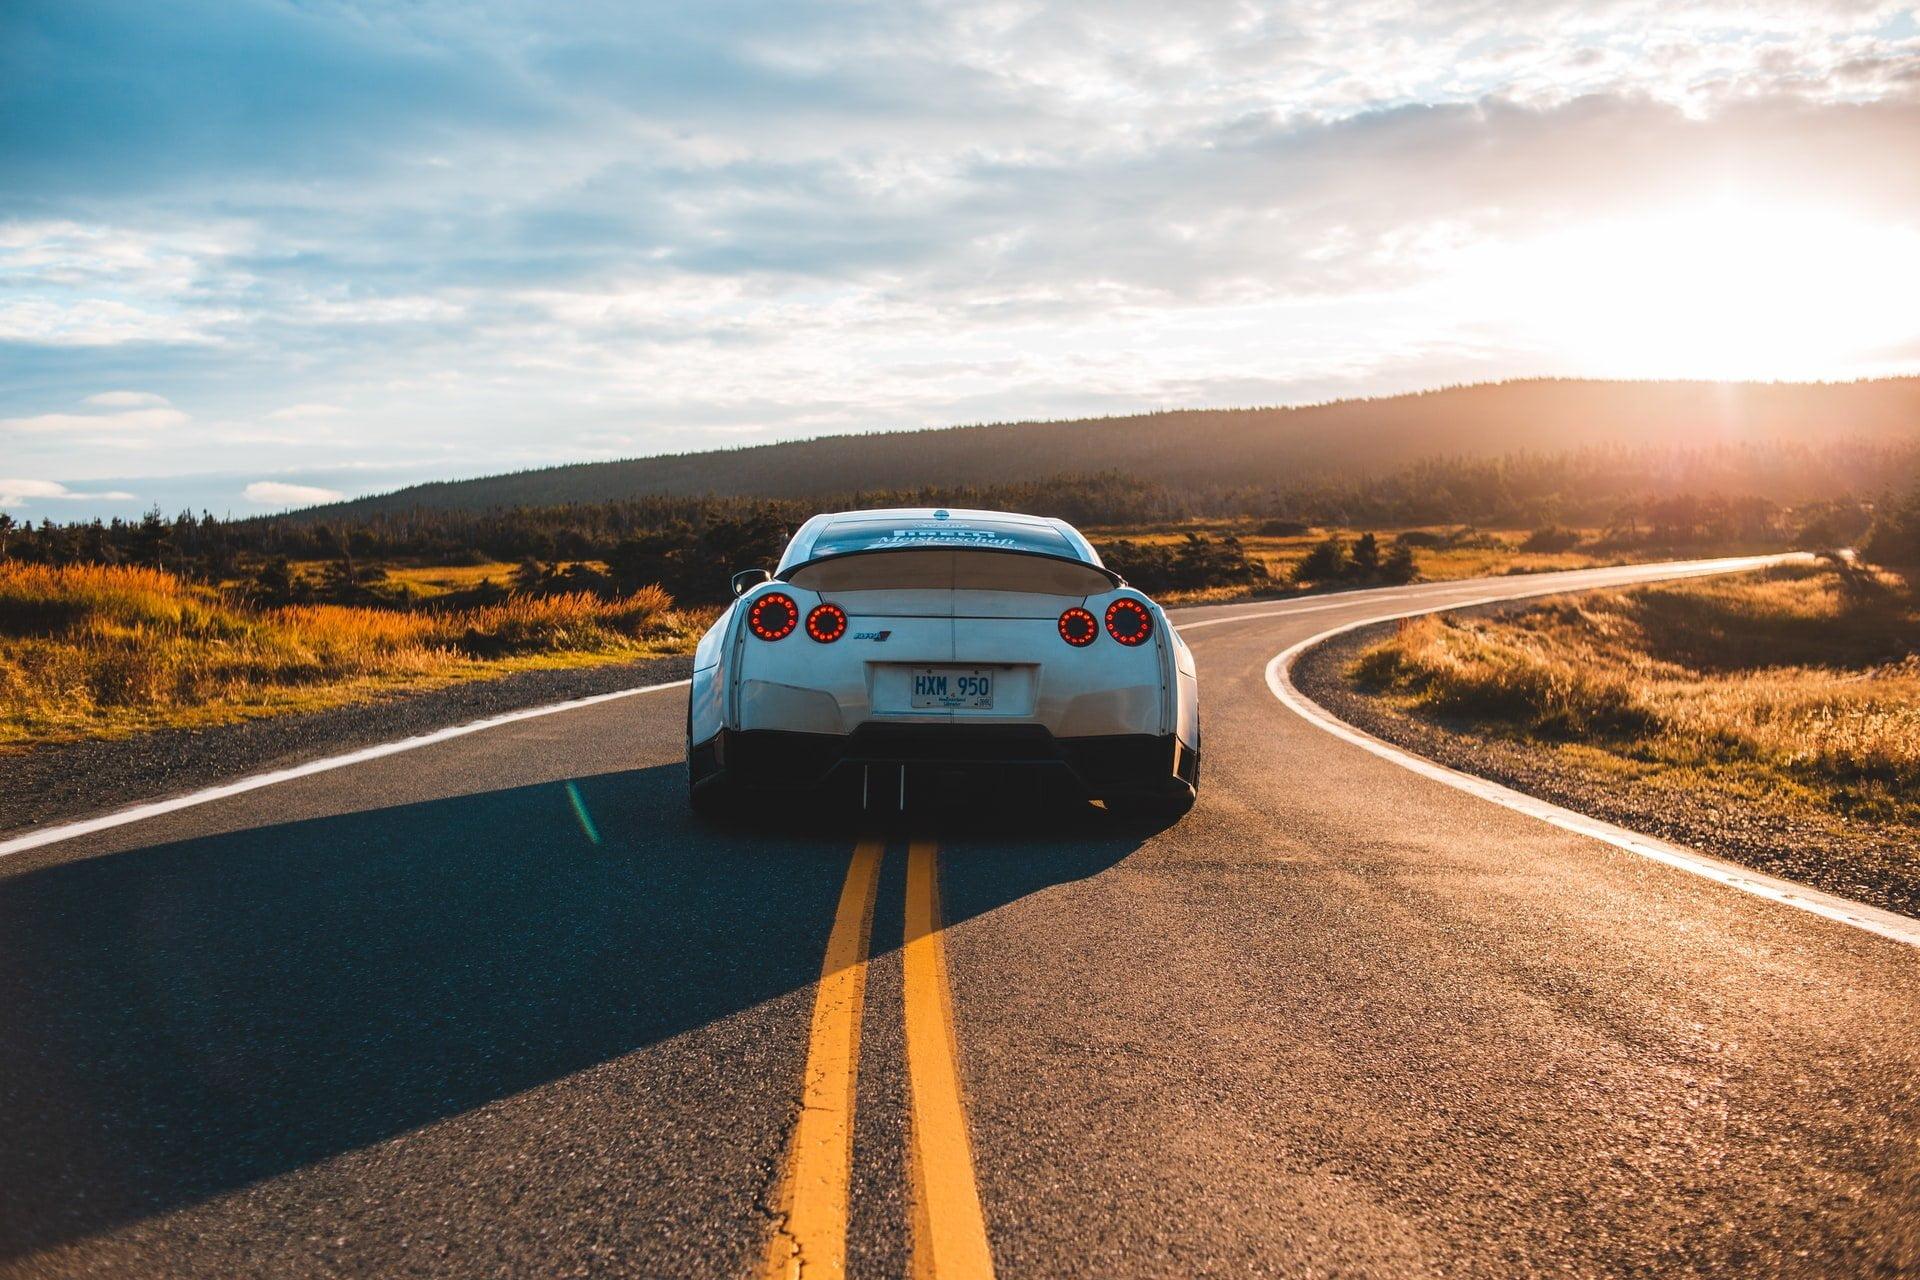 car on open road